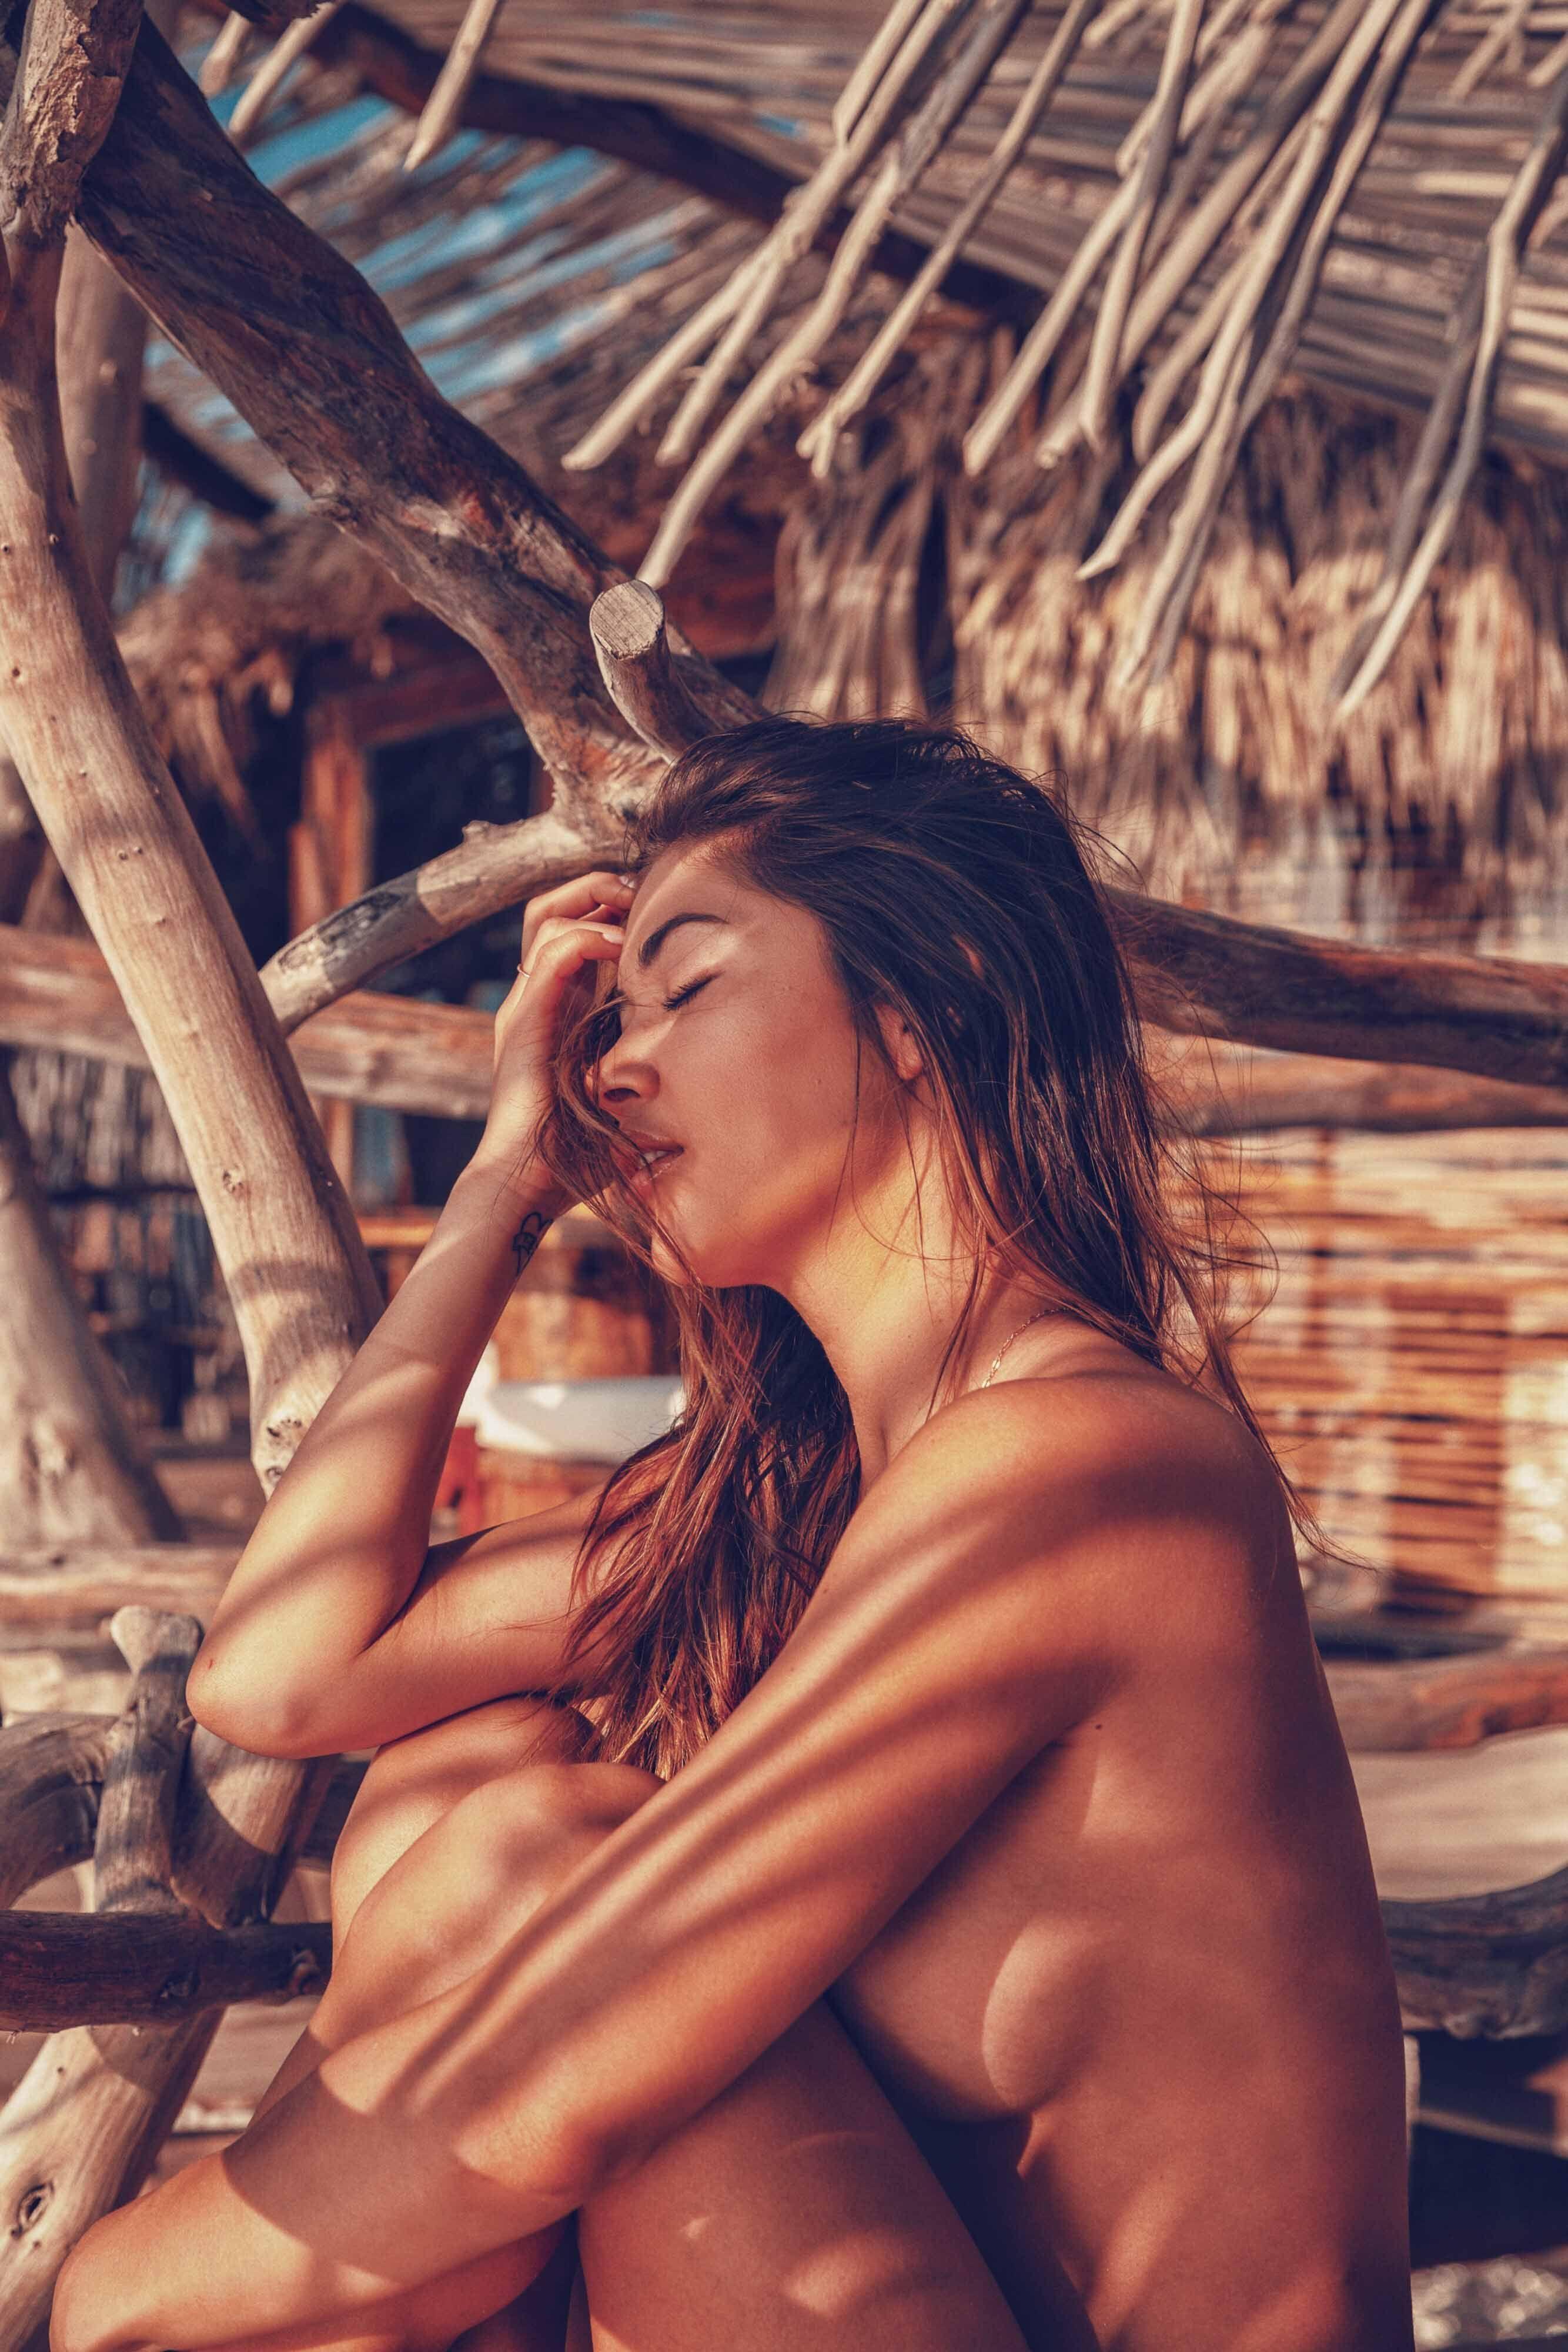 cameltoe TheFappening Arianny Celeste naked photo 2017